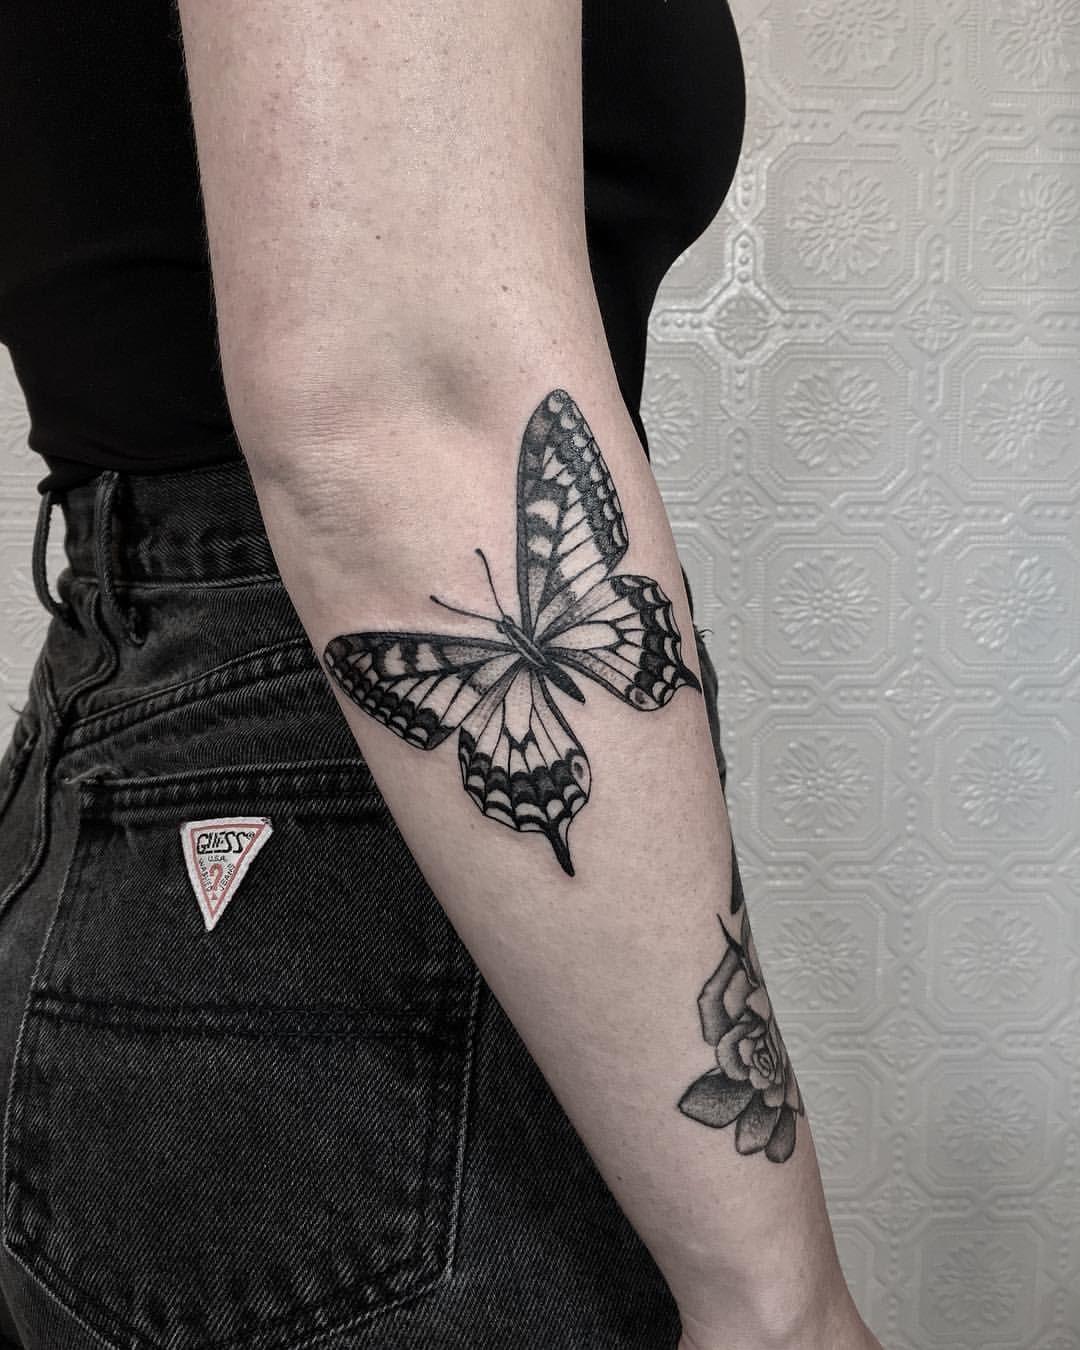 Butterfly for Bethany. blacktattooart blacktattoo